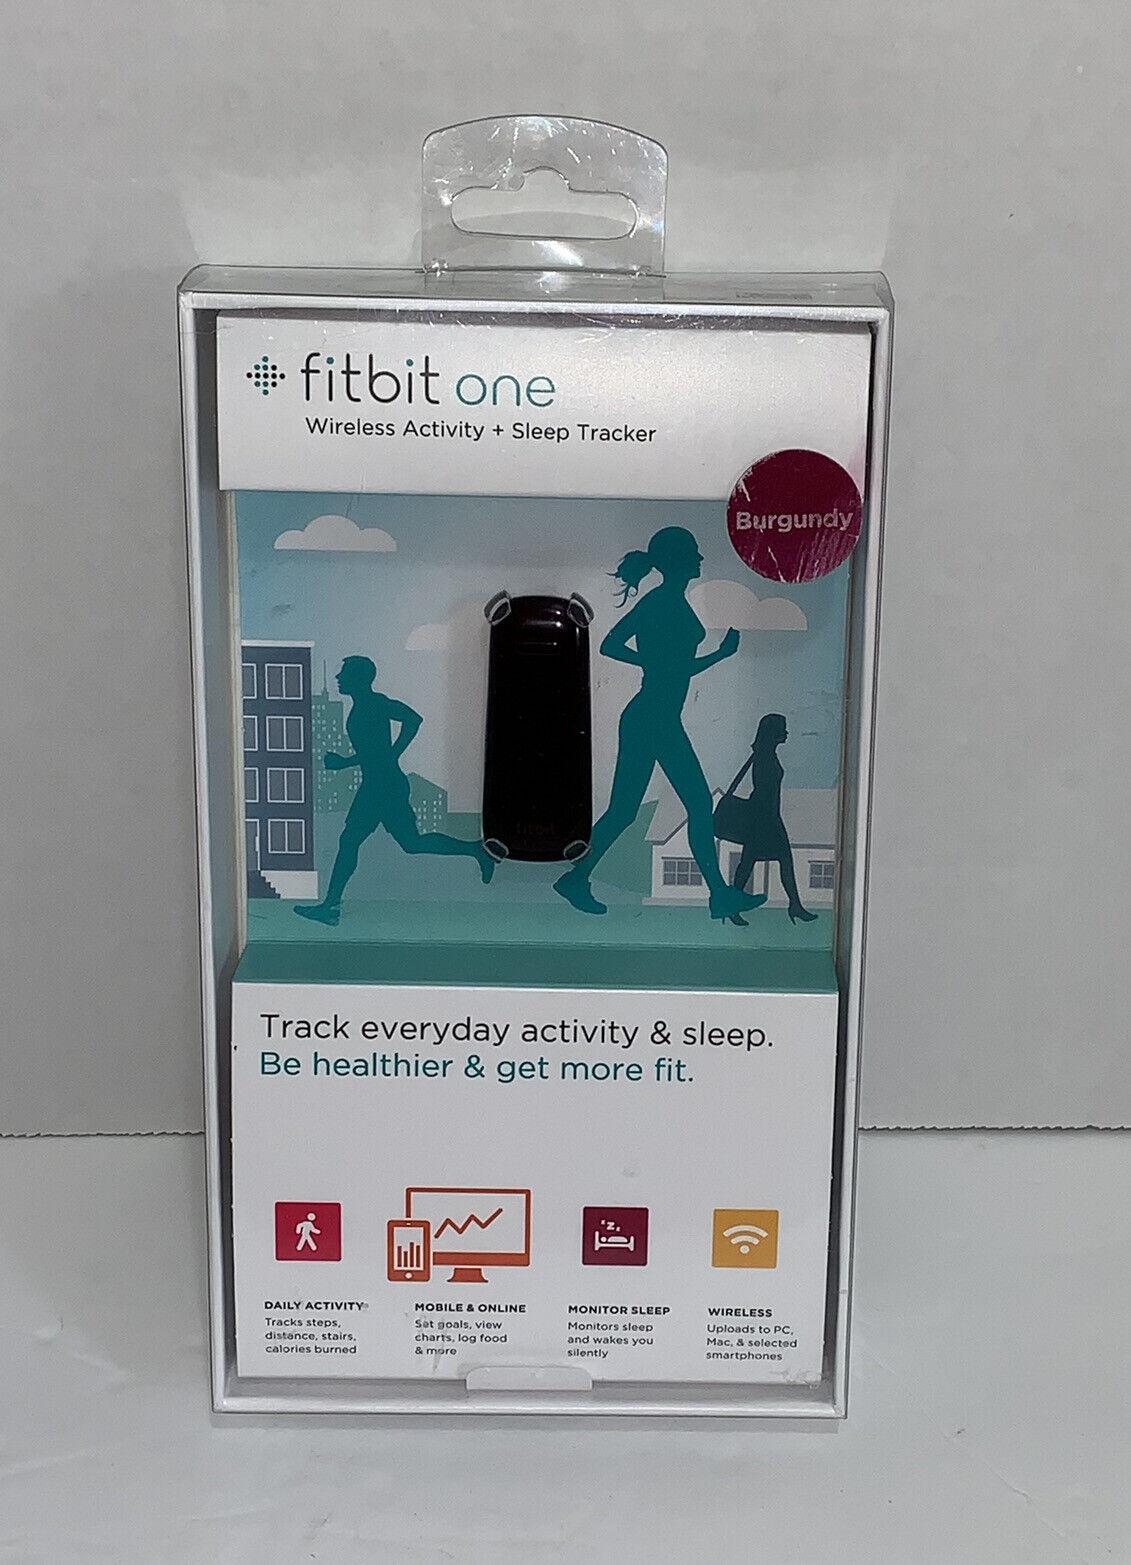 NEW Fitbit One Wireless Activity Plus Sleep Tracker Burgundy